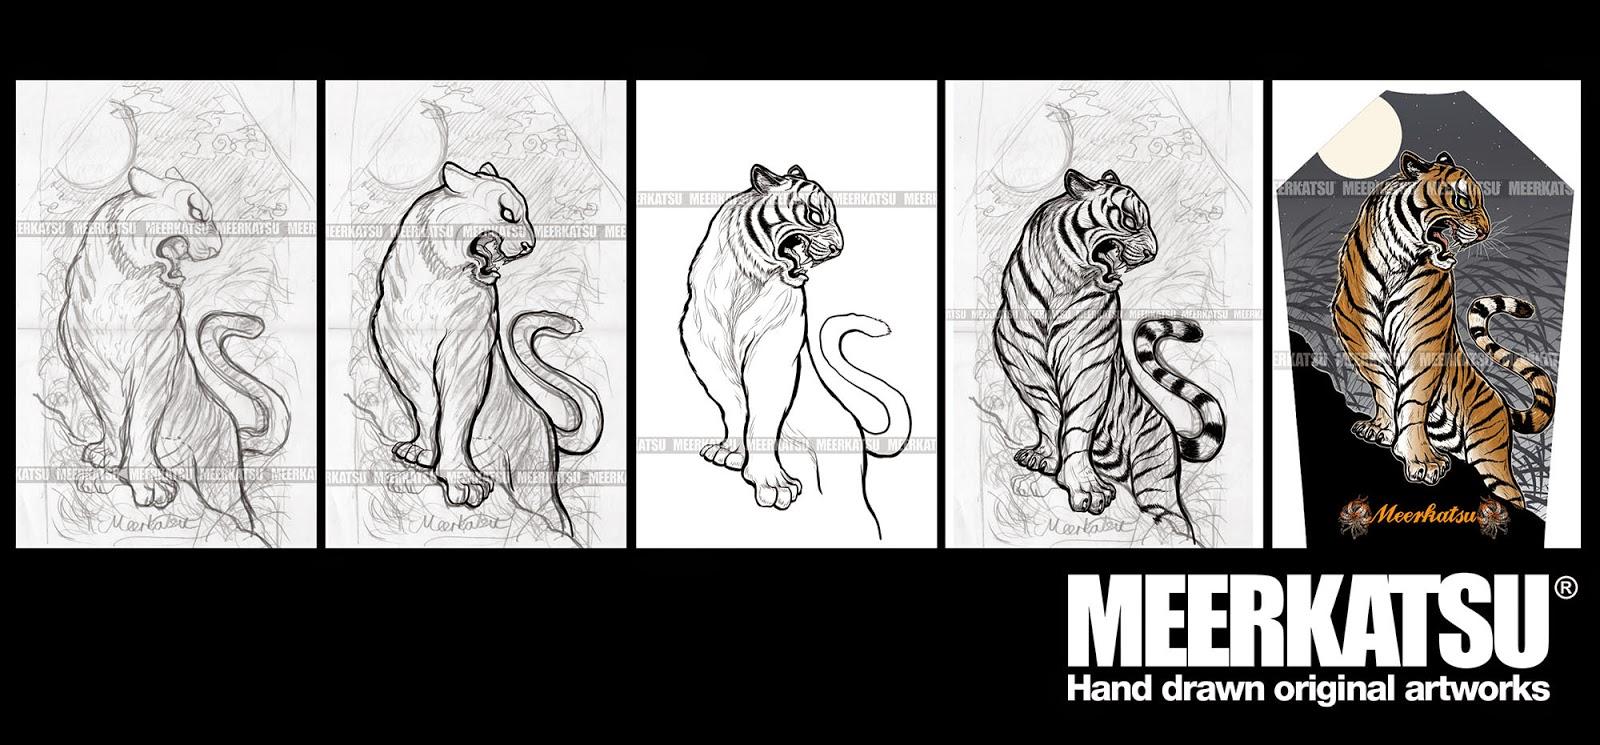 340c3d37e9c9d Meerkatsu Art: Midnight Tigers